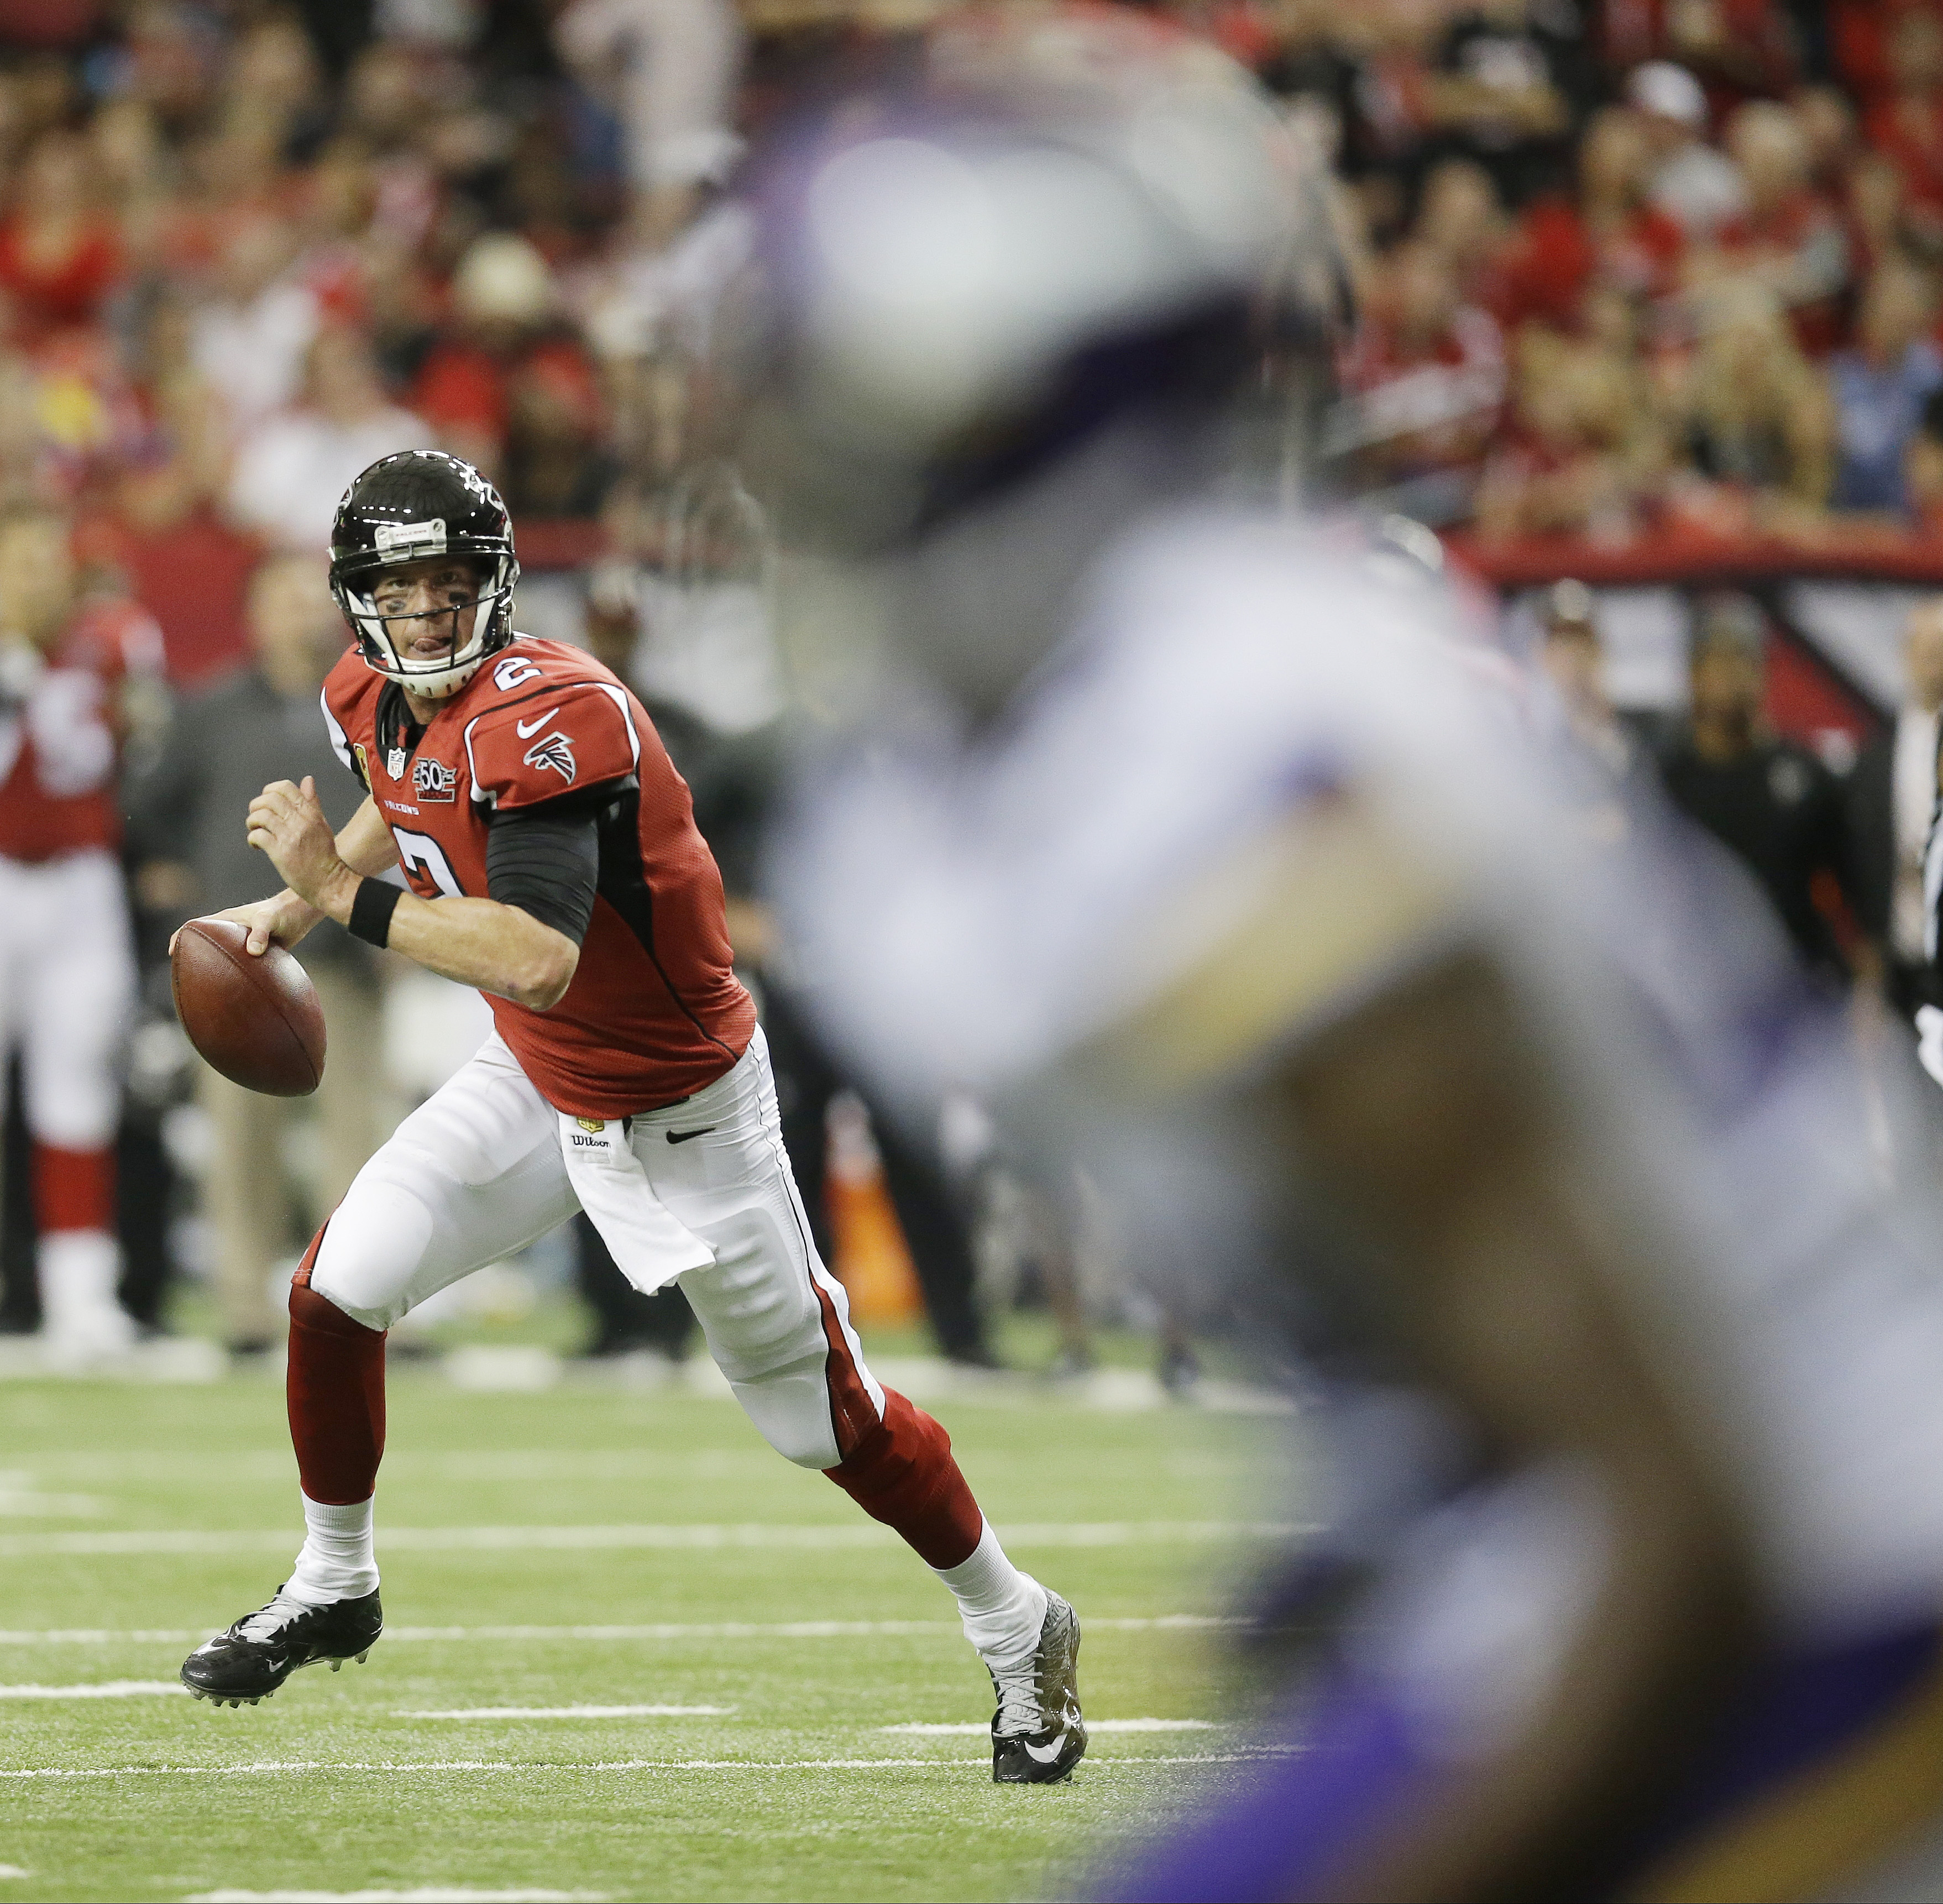 Atlanta Falcons quarterback Matt Ryan (2) runs out of the pocket against the Minnesota Vikings during the second half of an NFL football game, Sunday, Nov. 29, 2015, in Atlanta. (AP Photo/David Goldman)